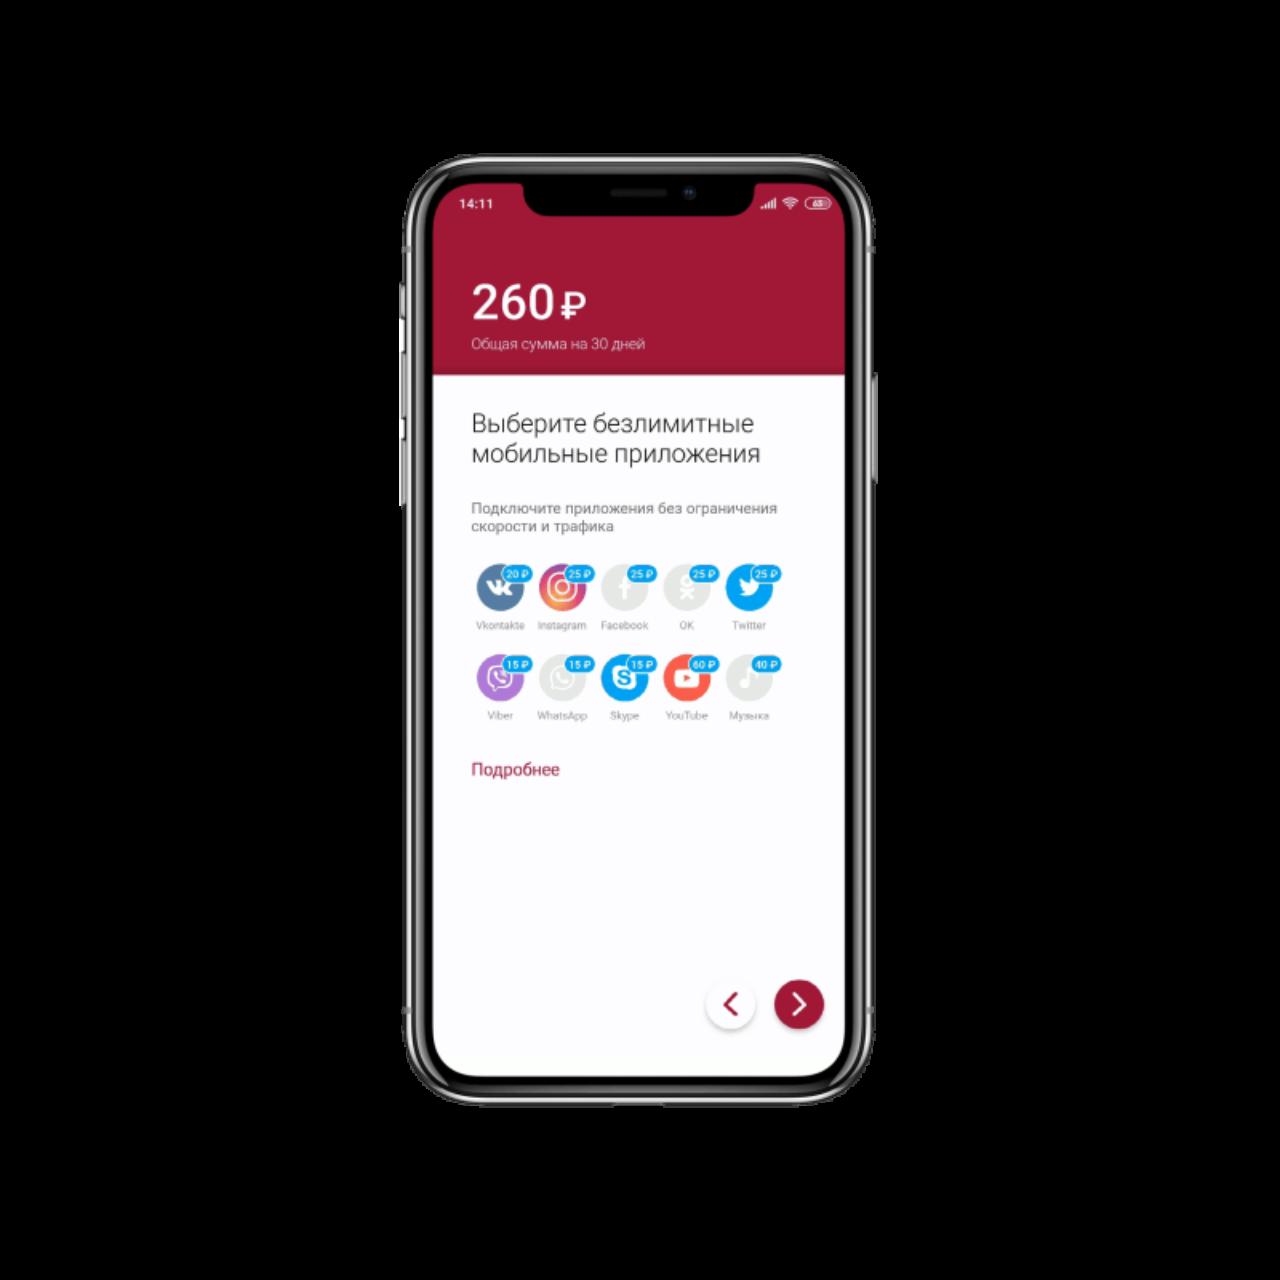 Mobile operator application - choose apps